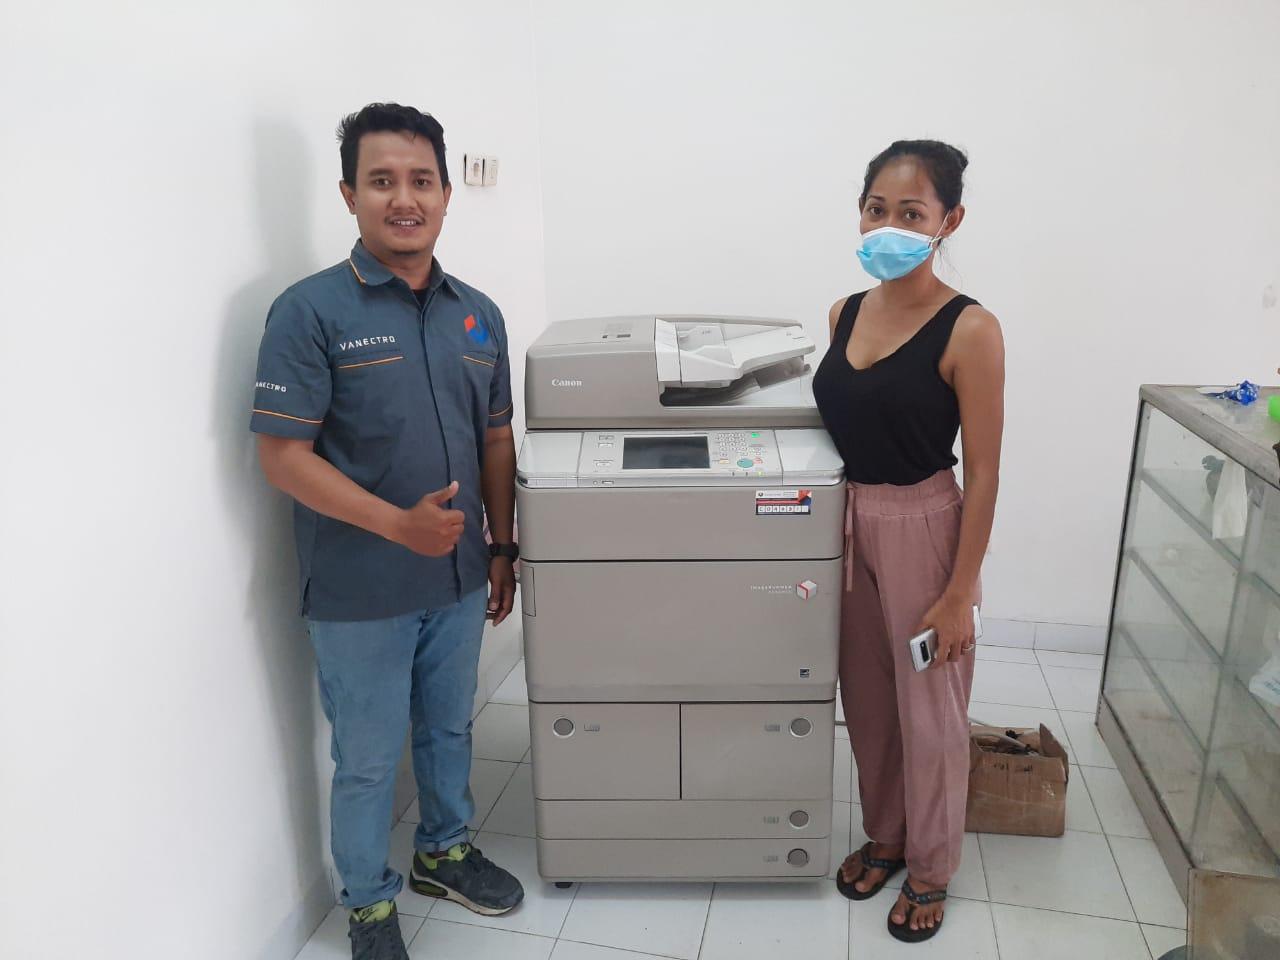 Pengiriman Penjualan Mesin Fotocopy Mesin Fotocopy Canon Ira 6275 | 6265 | 6255 Milik Ibu Nick Noll